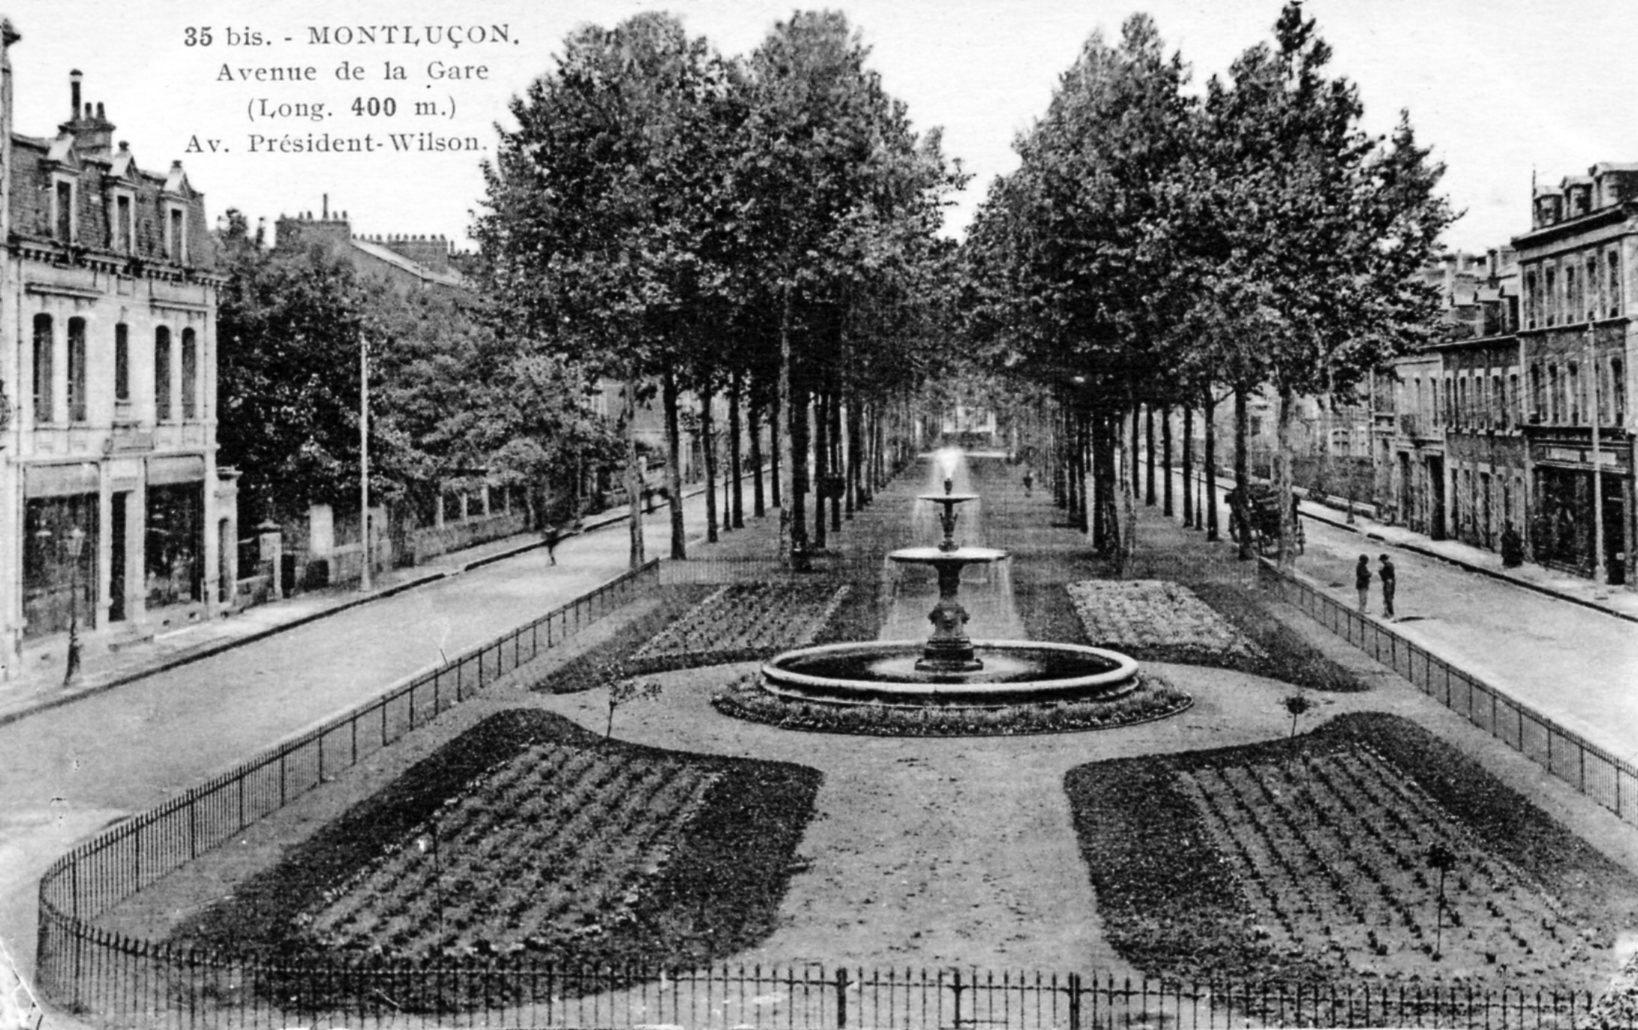 photo montlu on 03100 avenue de la gare long 400m av pr sident wilson vers 1920. Black Bedroom Furniture Sets. Home Design Ideas